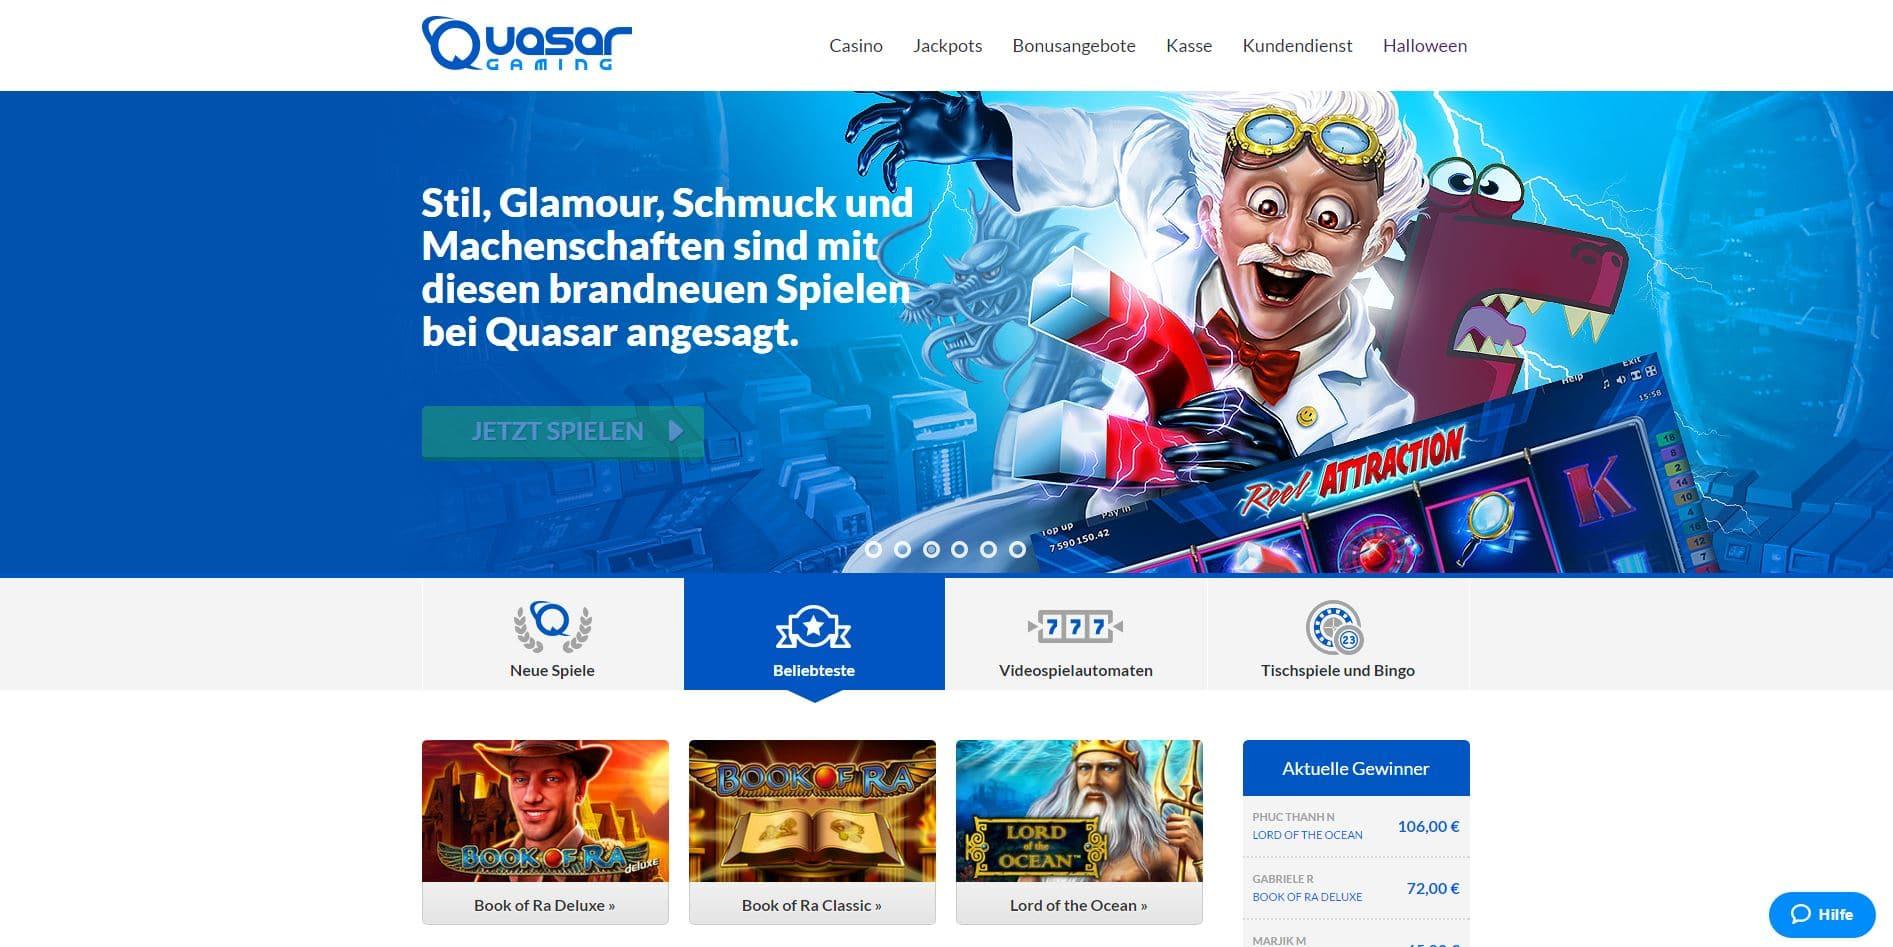 Gambling sites not on gamestop